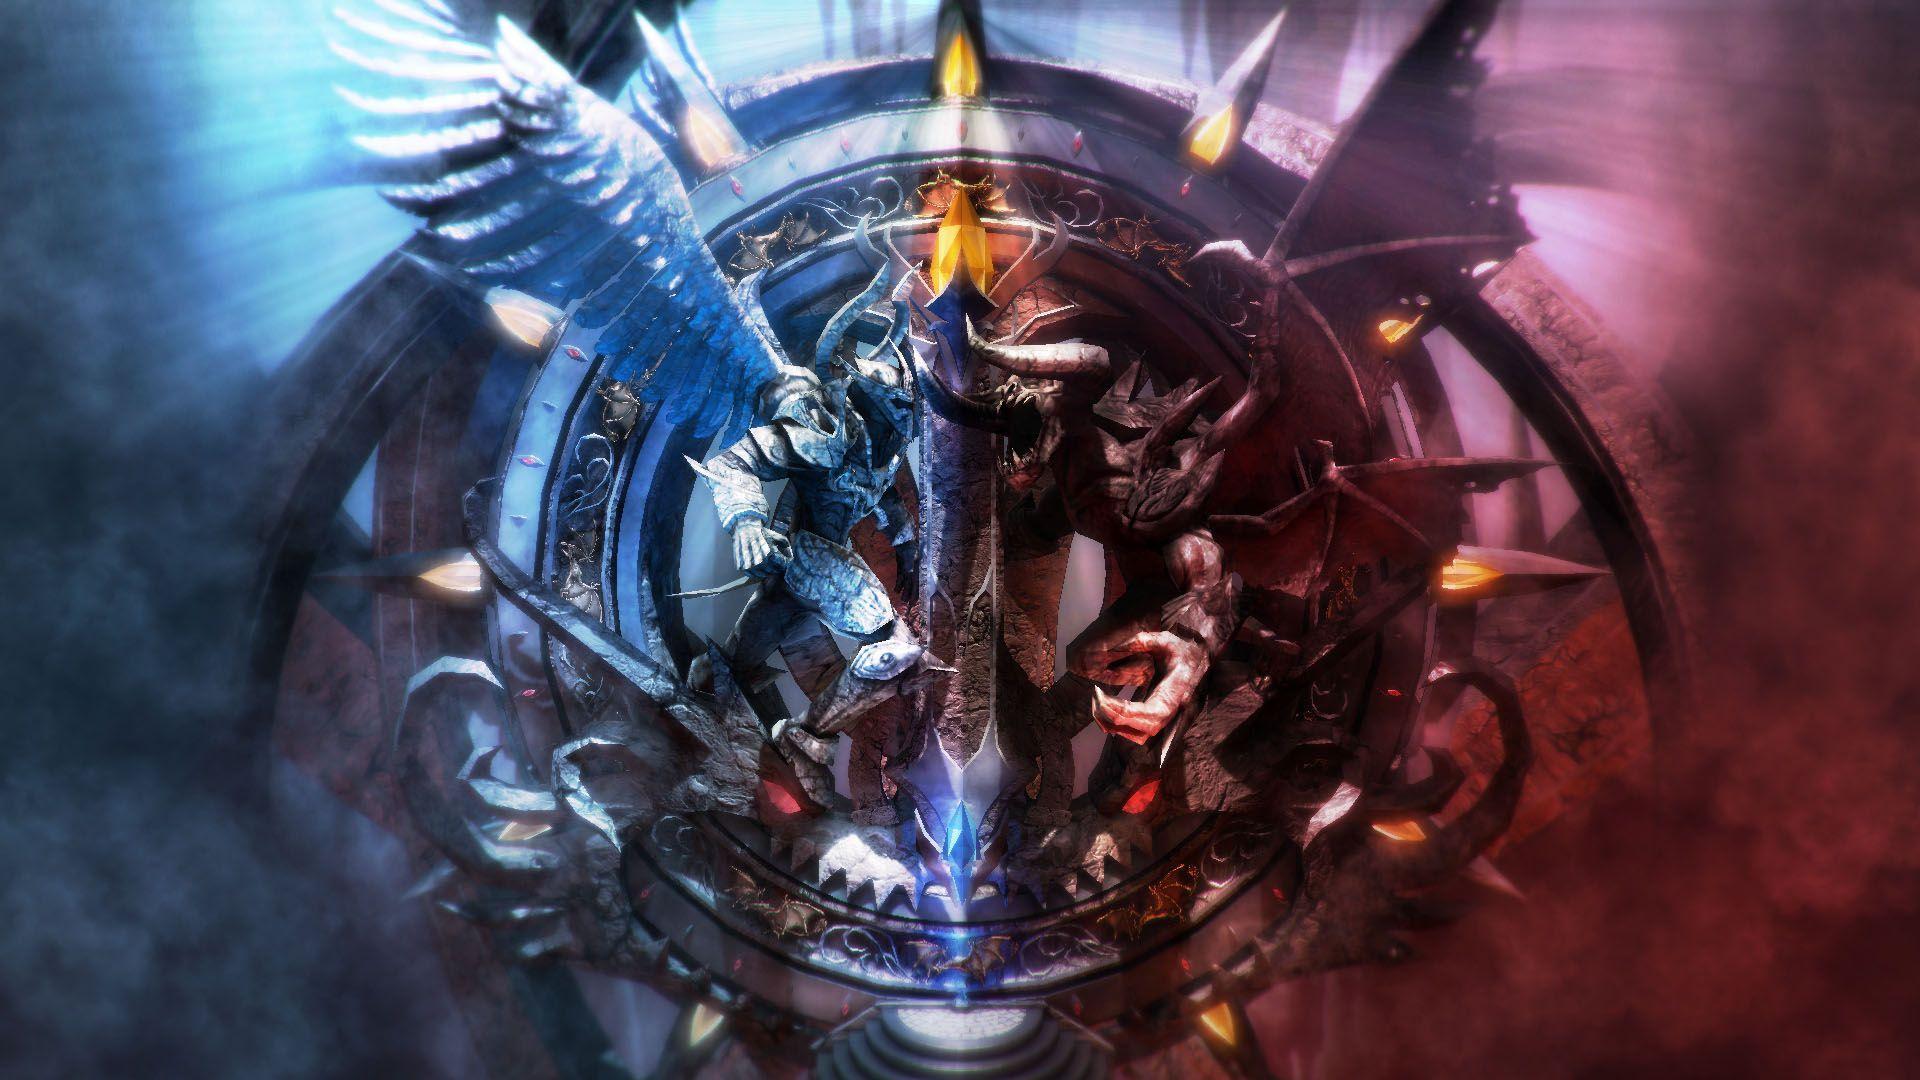 Titan Destiny 2 4K Wallpapers - Top Free Titan Destiny 2 ...